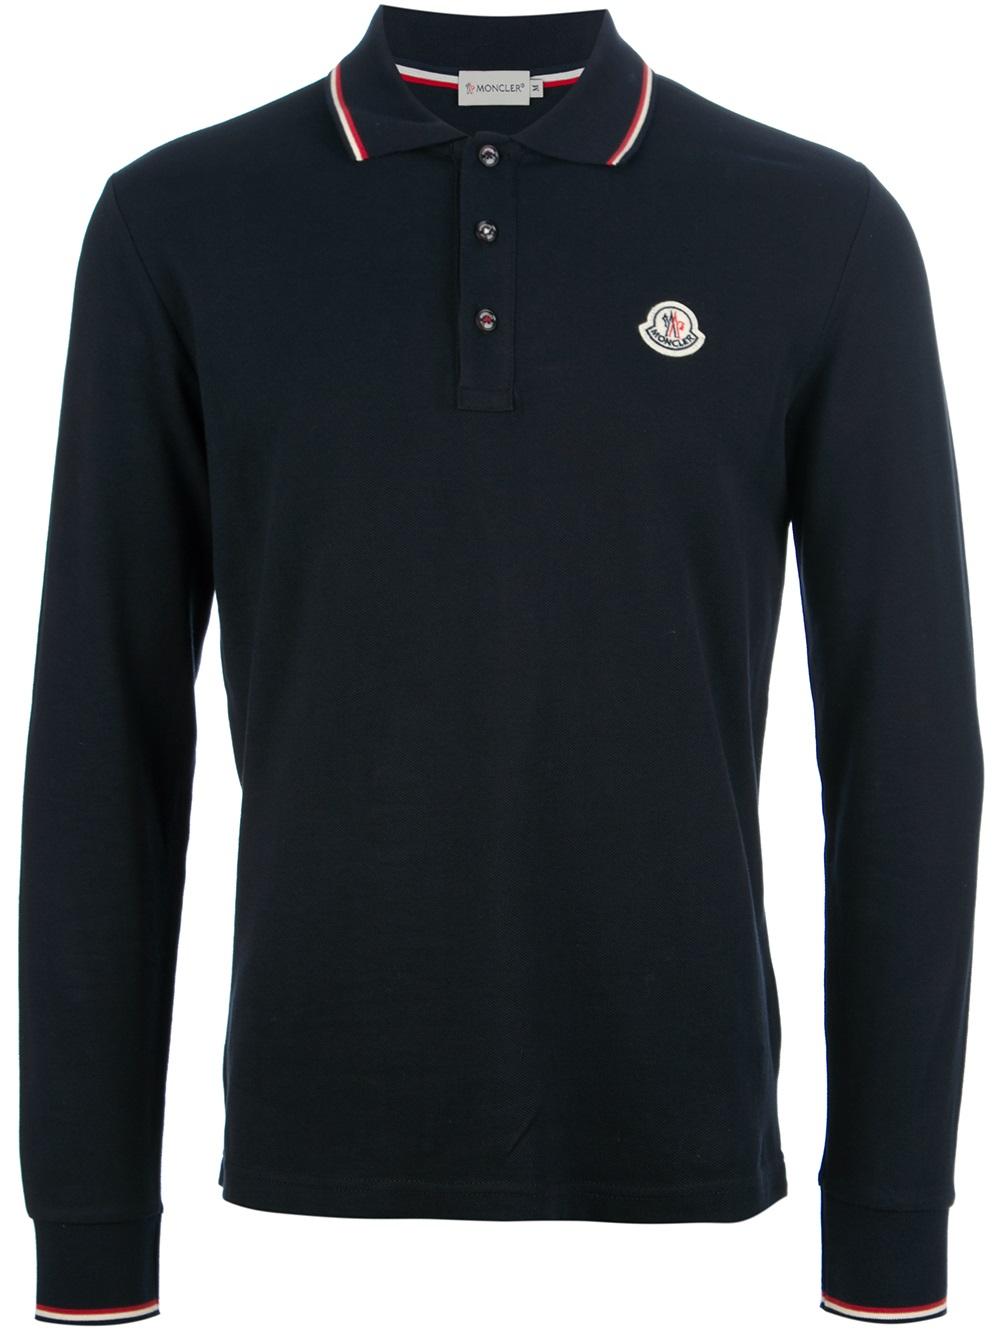 moncler long sleeved polo shirt in black for men navy lyst. Black Bedroom Furniture Sets. Home Design Ideas